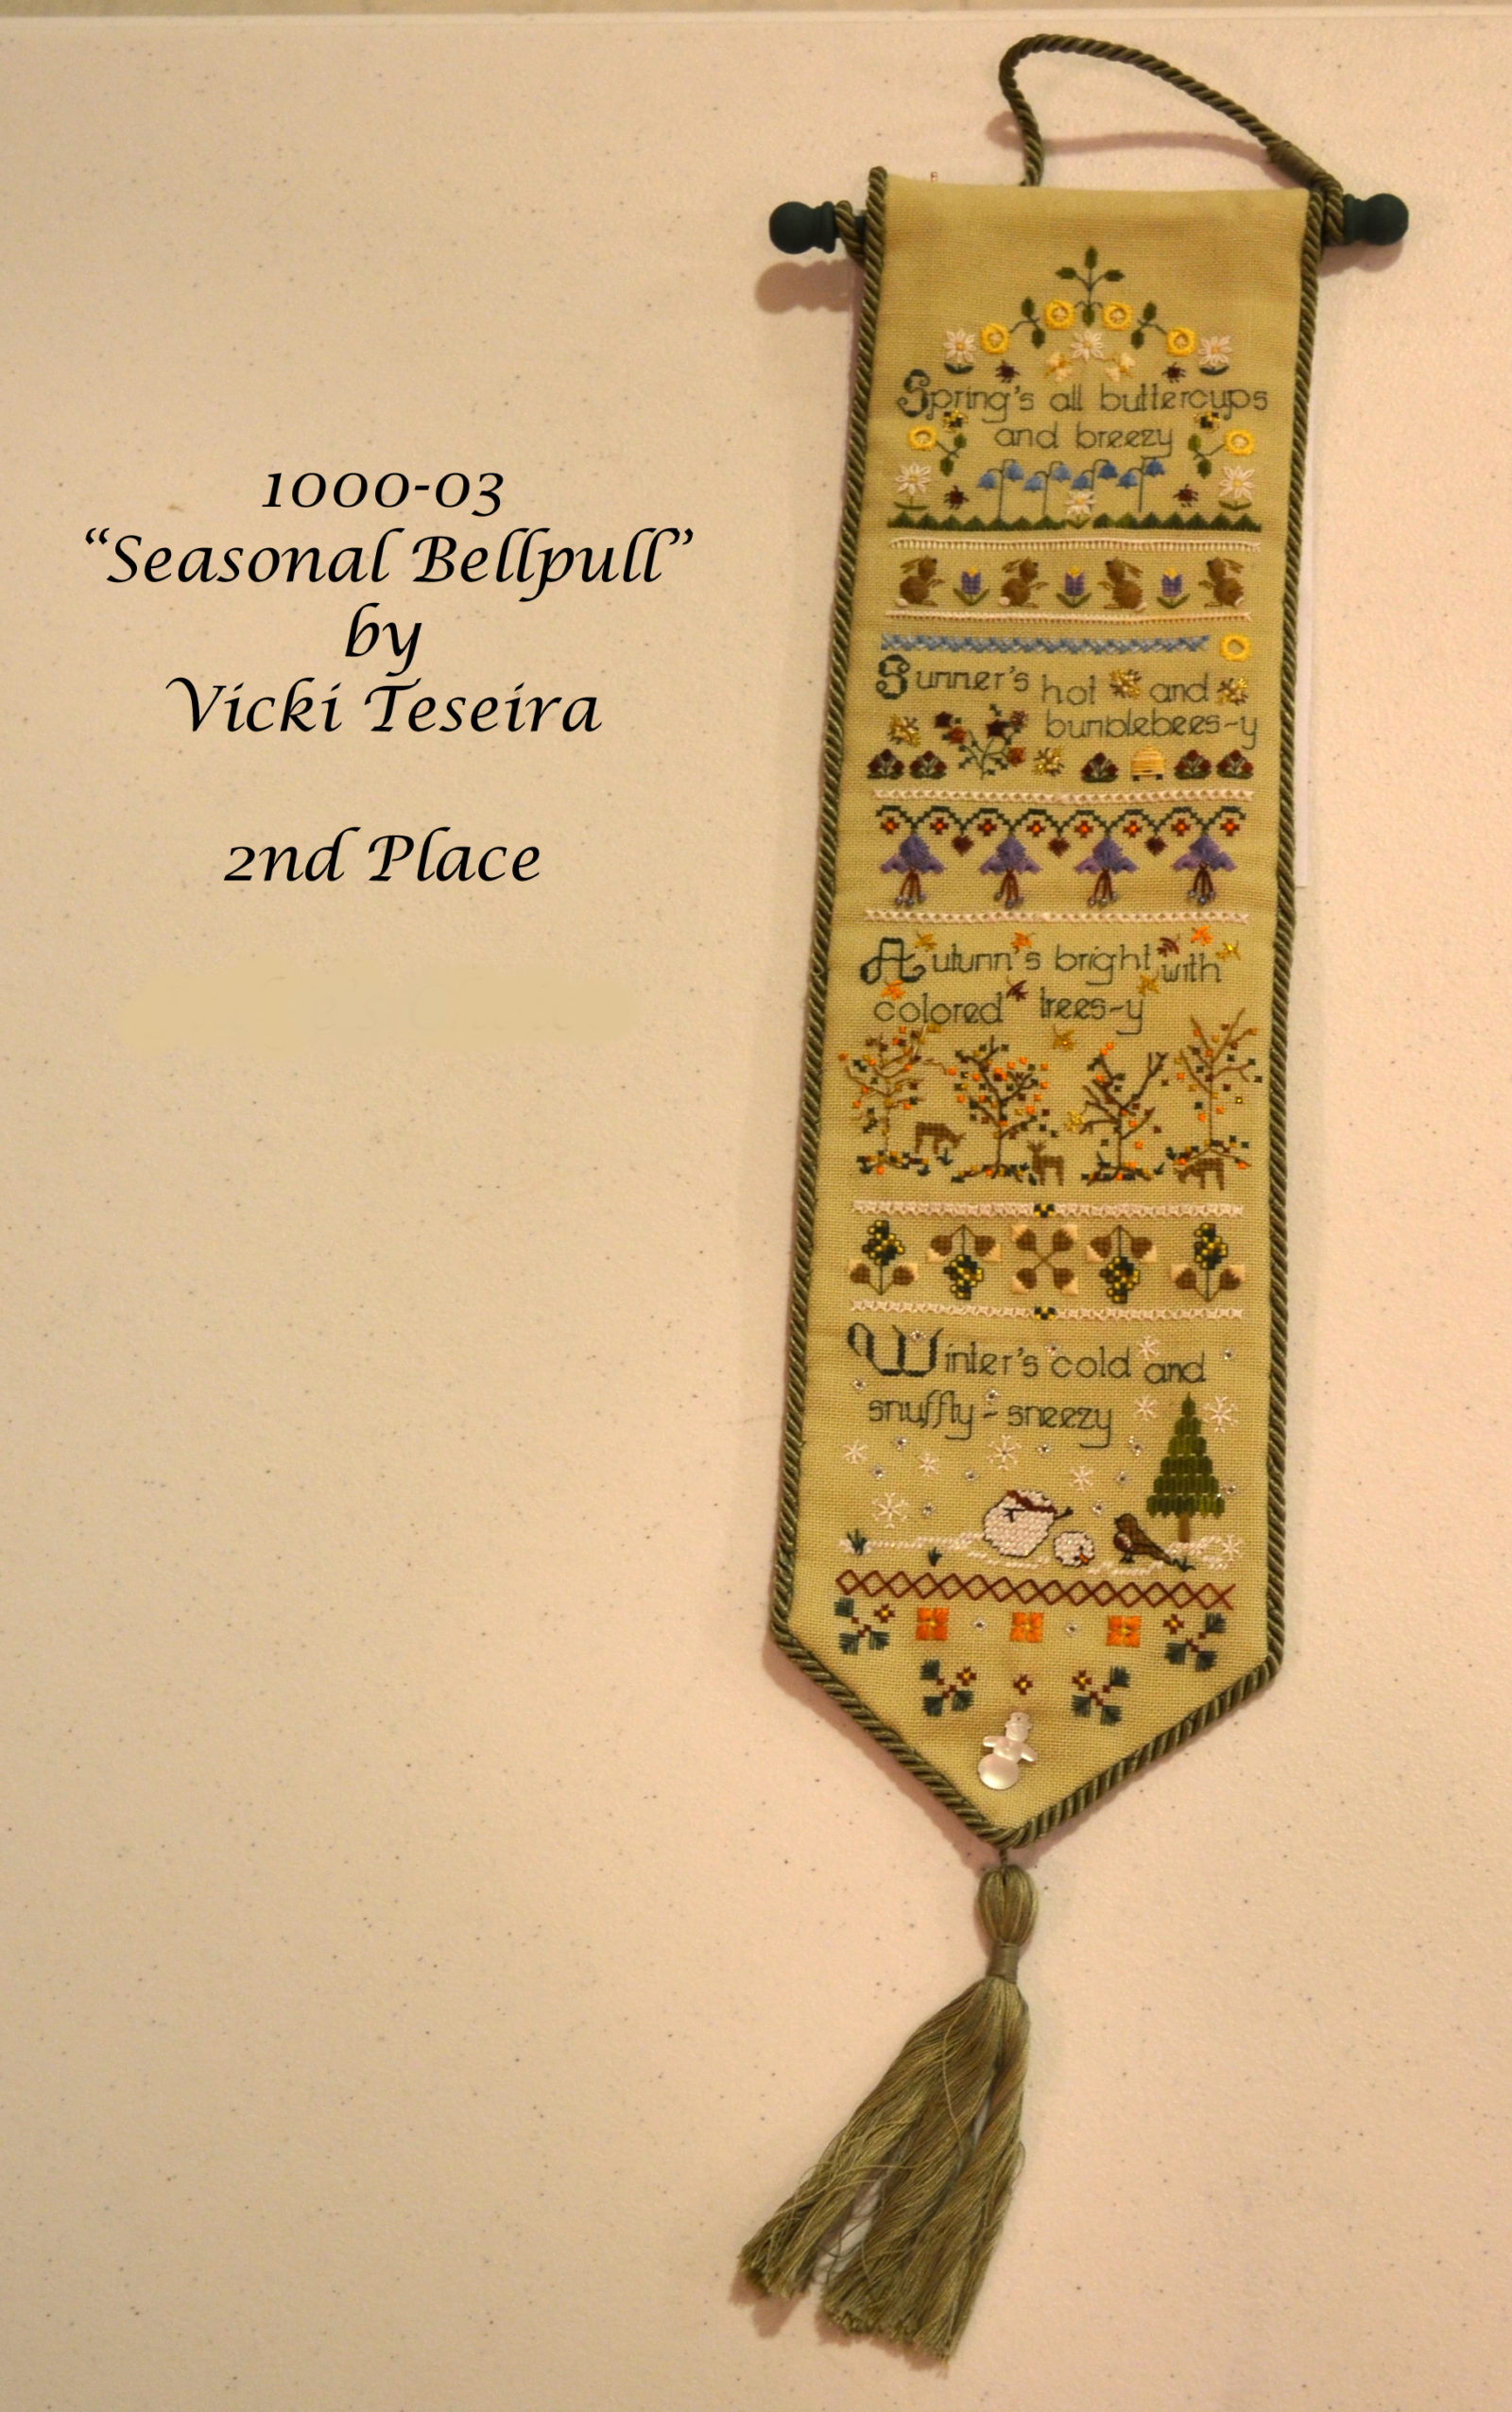 1000-03 Seasonal Bellpull